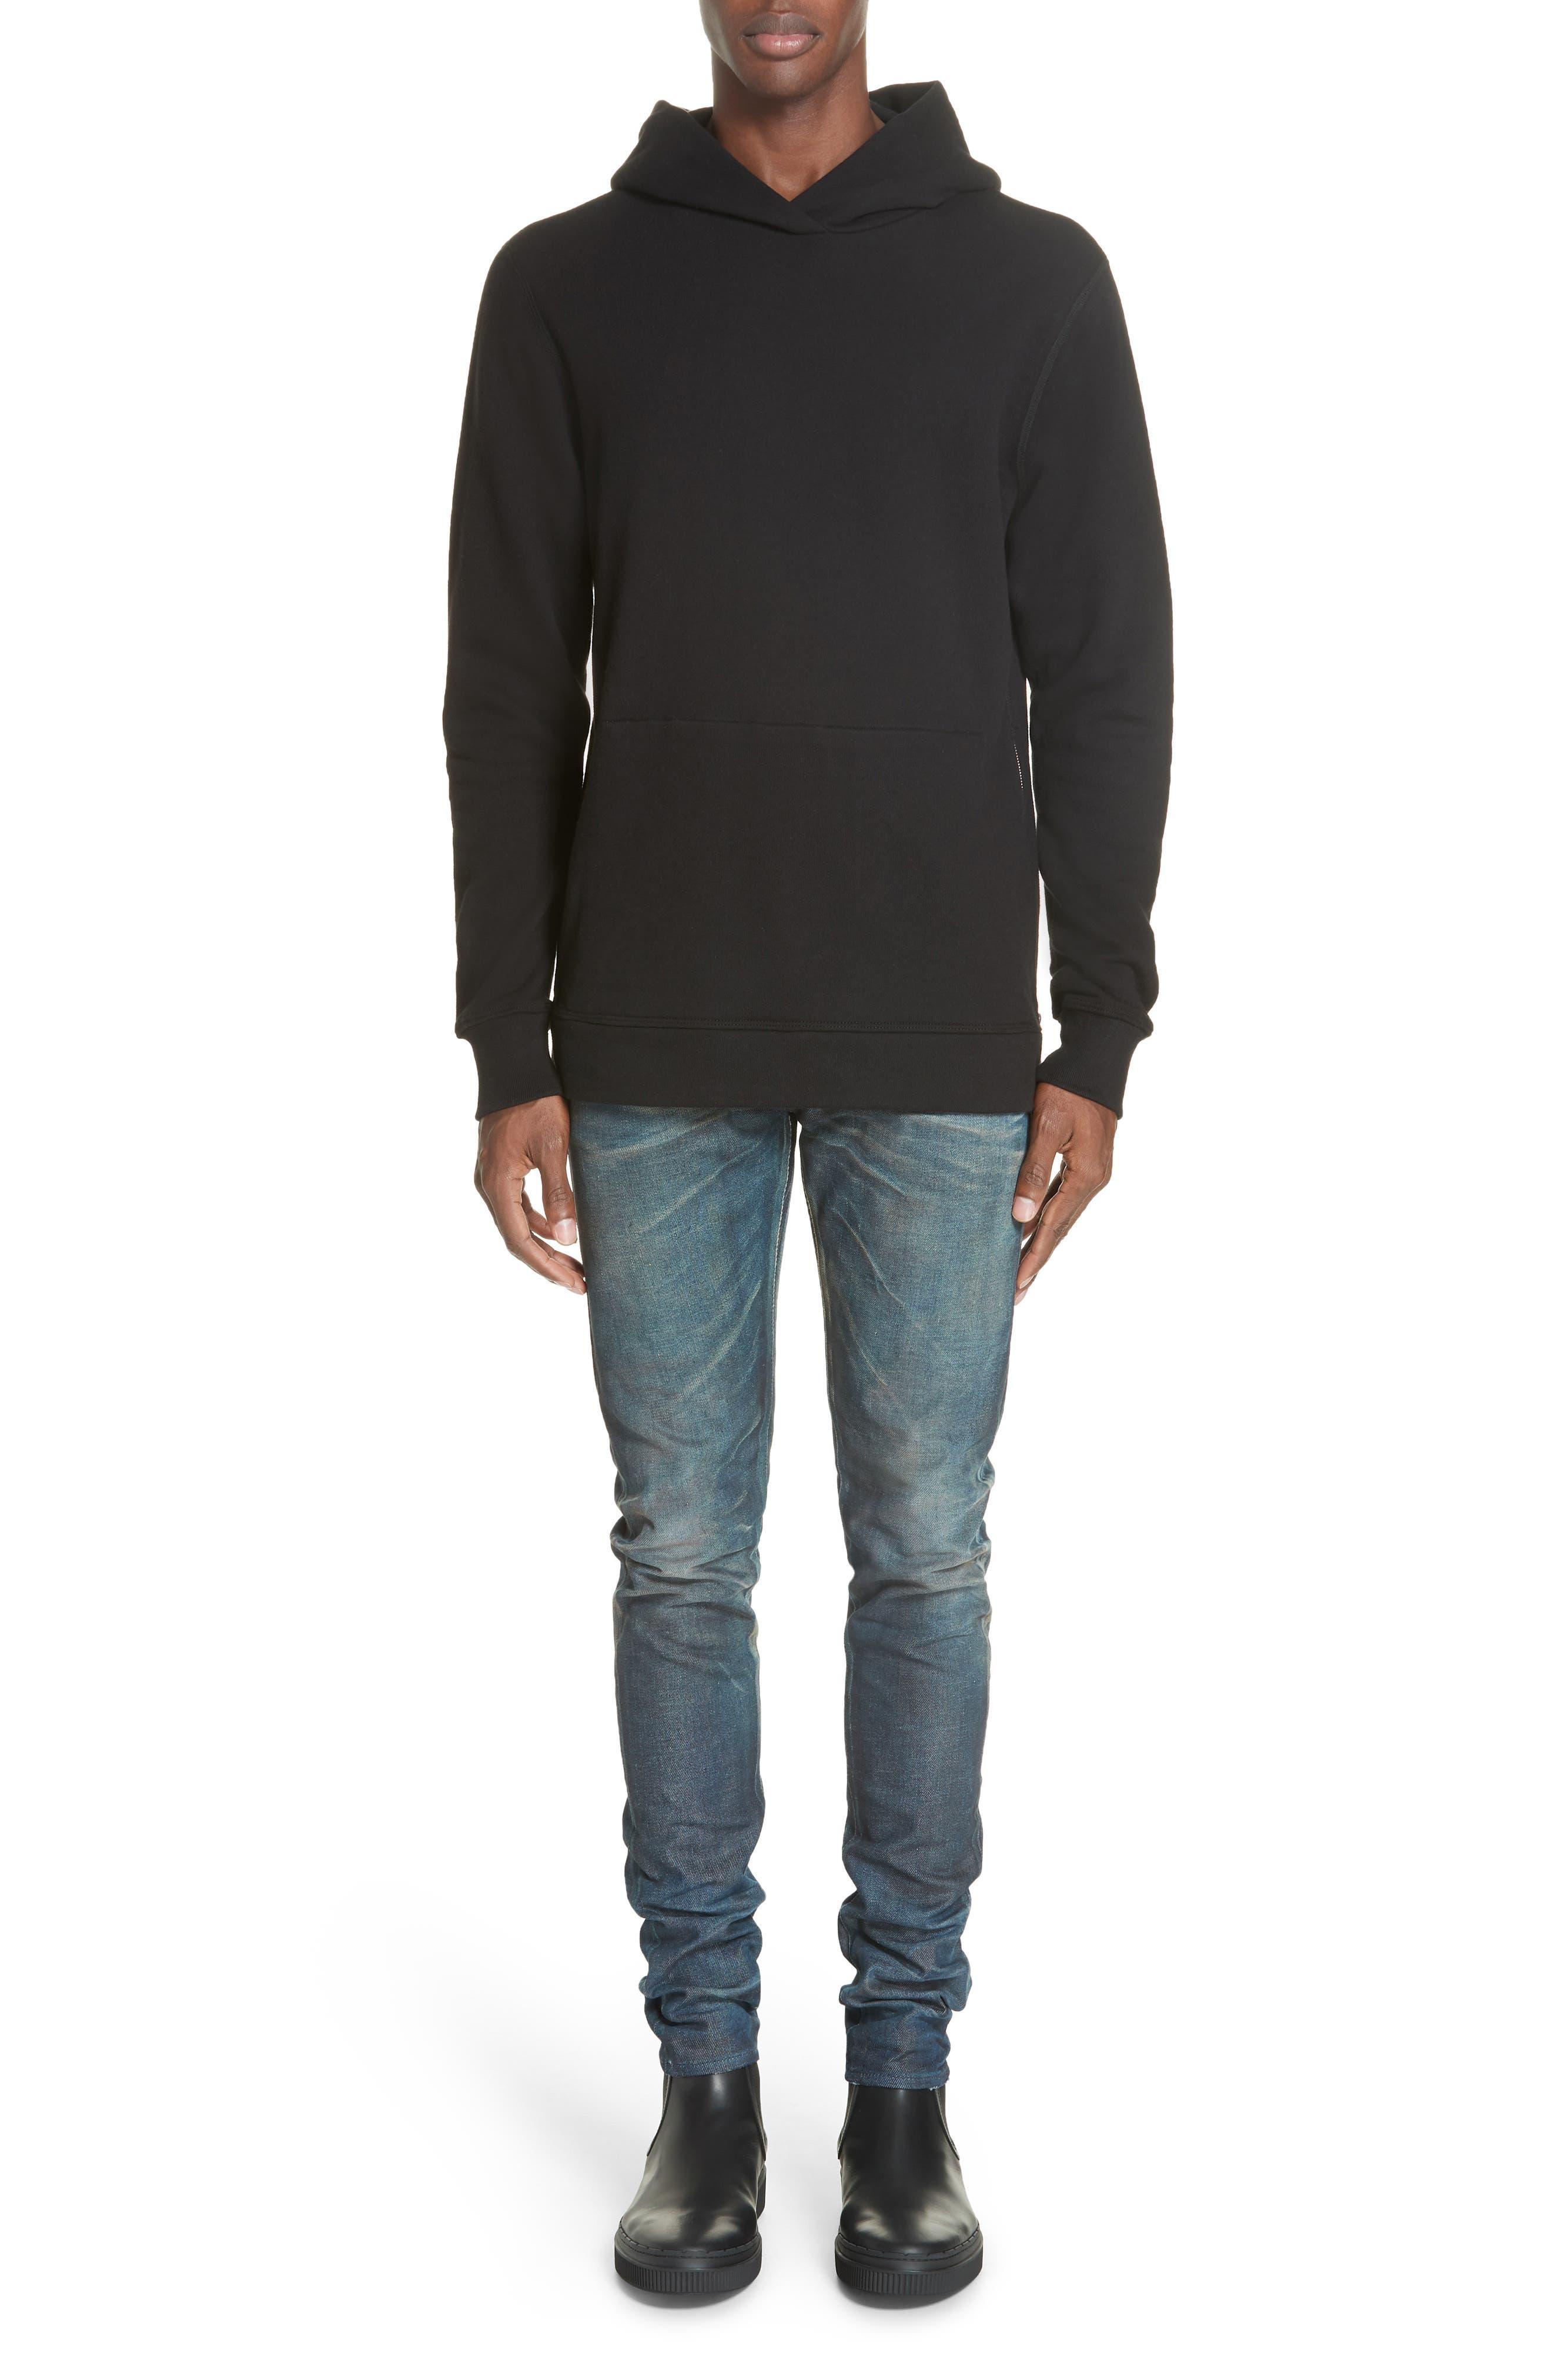 JOHN ELLIOTT, Hooded Villain Sweatshirt, Alternate thumbnail 7, color, BLACK